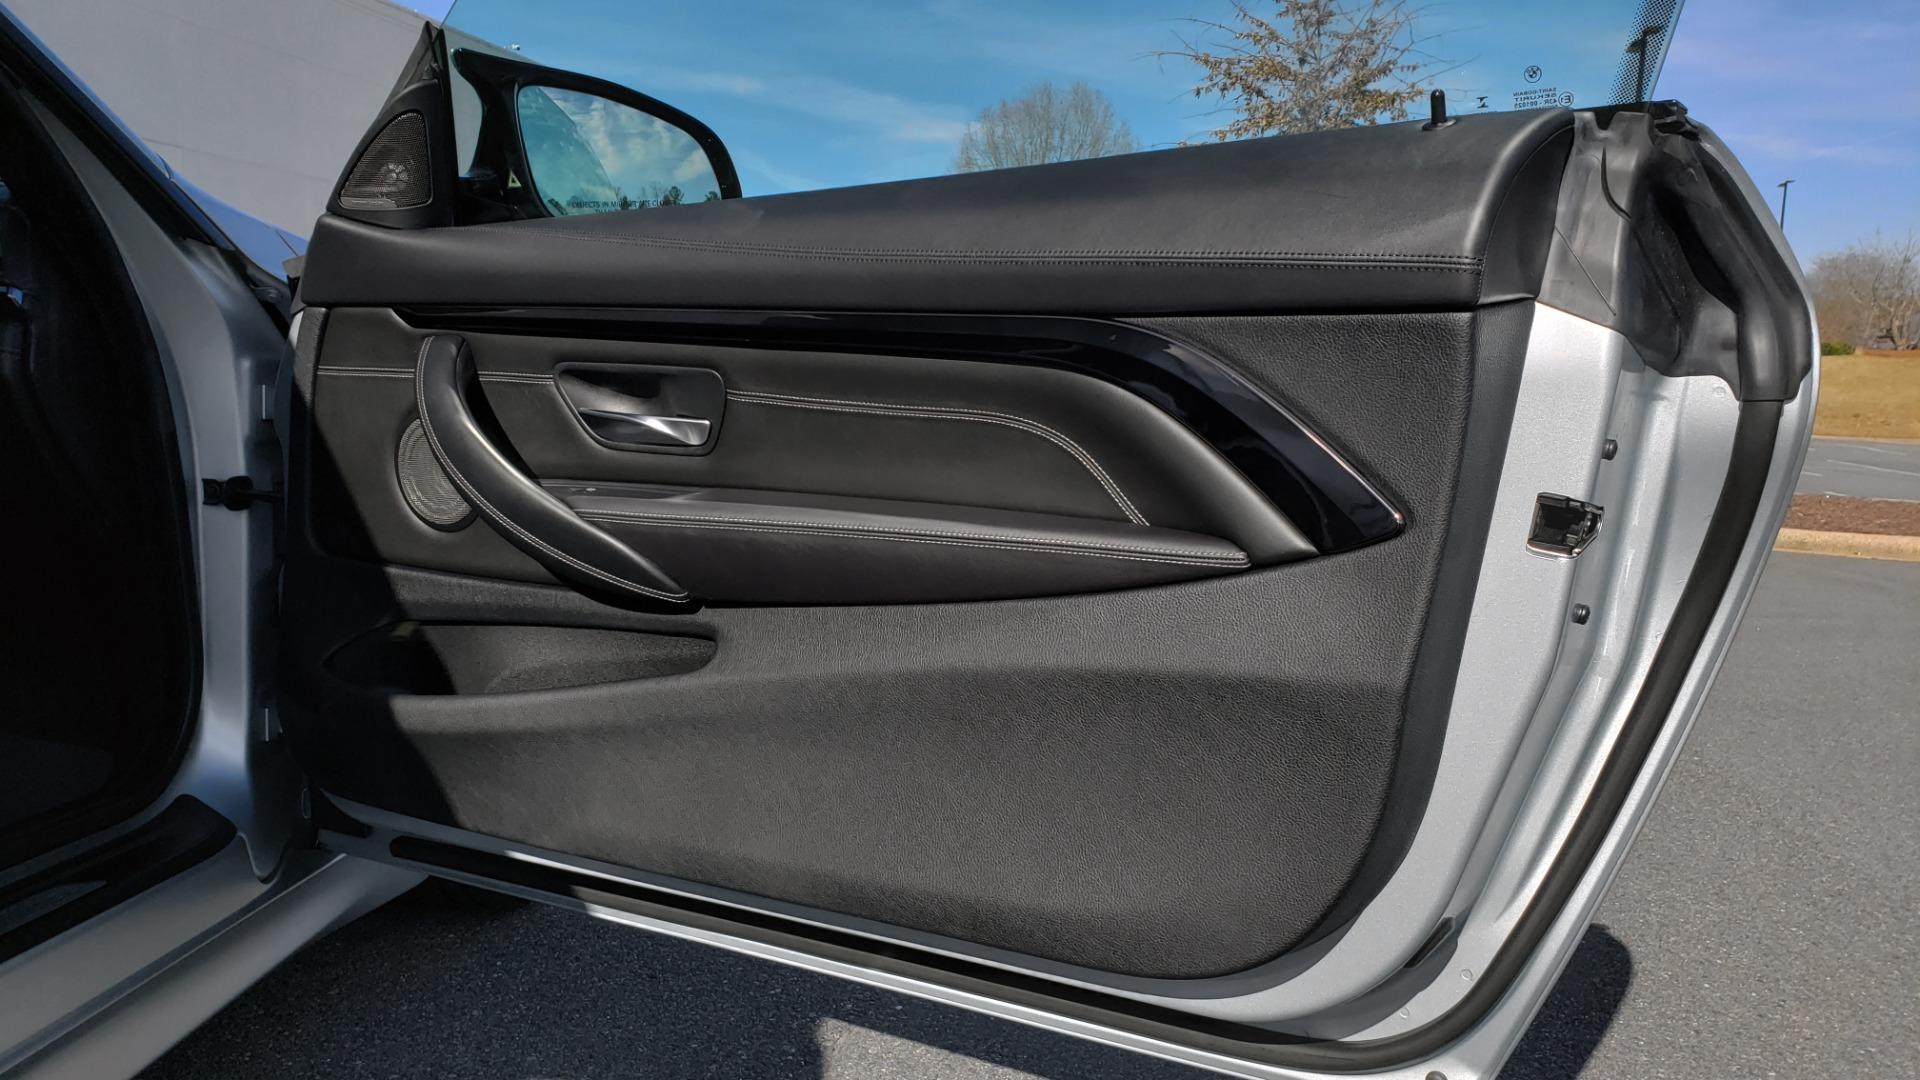 Used 2015 BMW M4 COUPE / EXEC PKG / DRVR ASST PLUS / LIGHTING / M-SUSPENSION for sale Sold at Formula Imports in Charlotte NC 28227 73